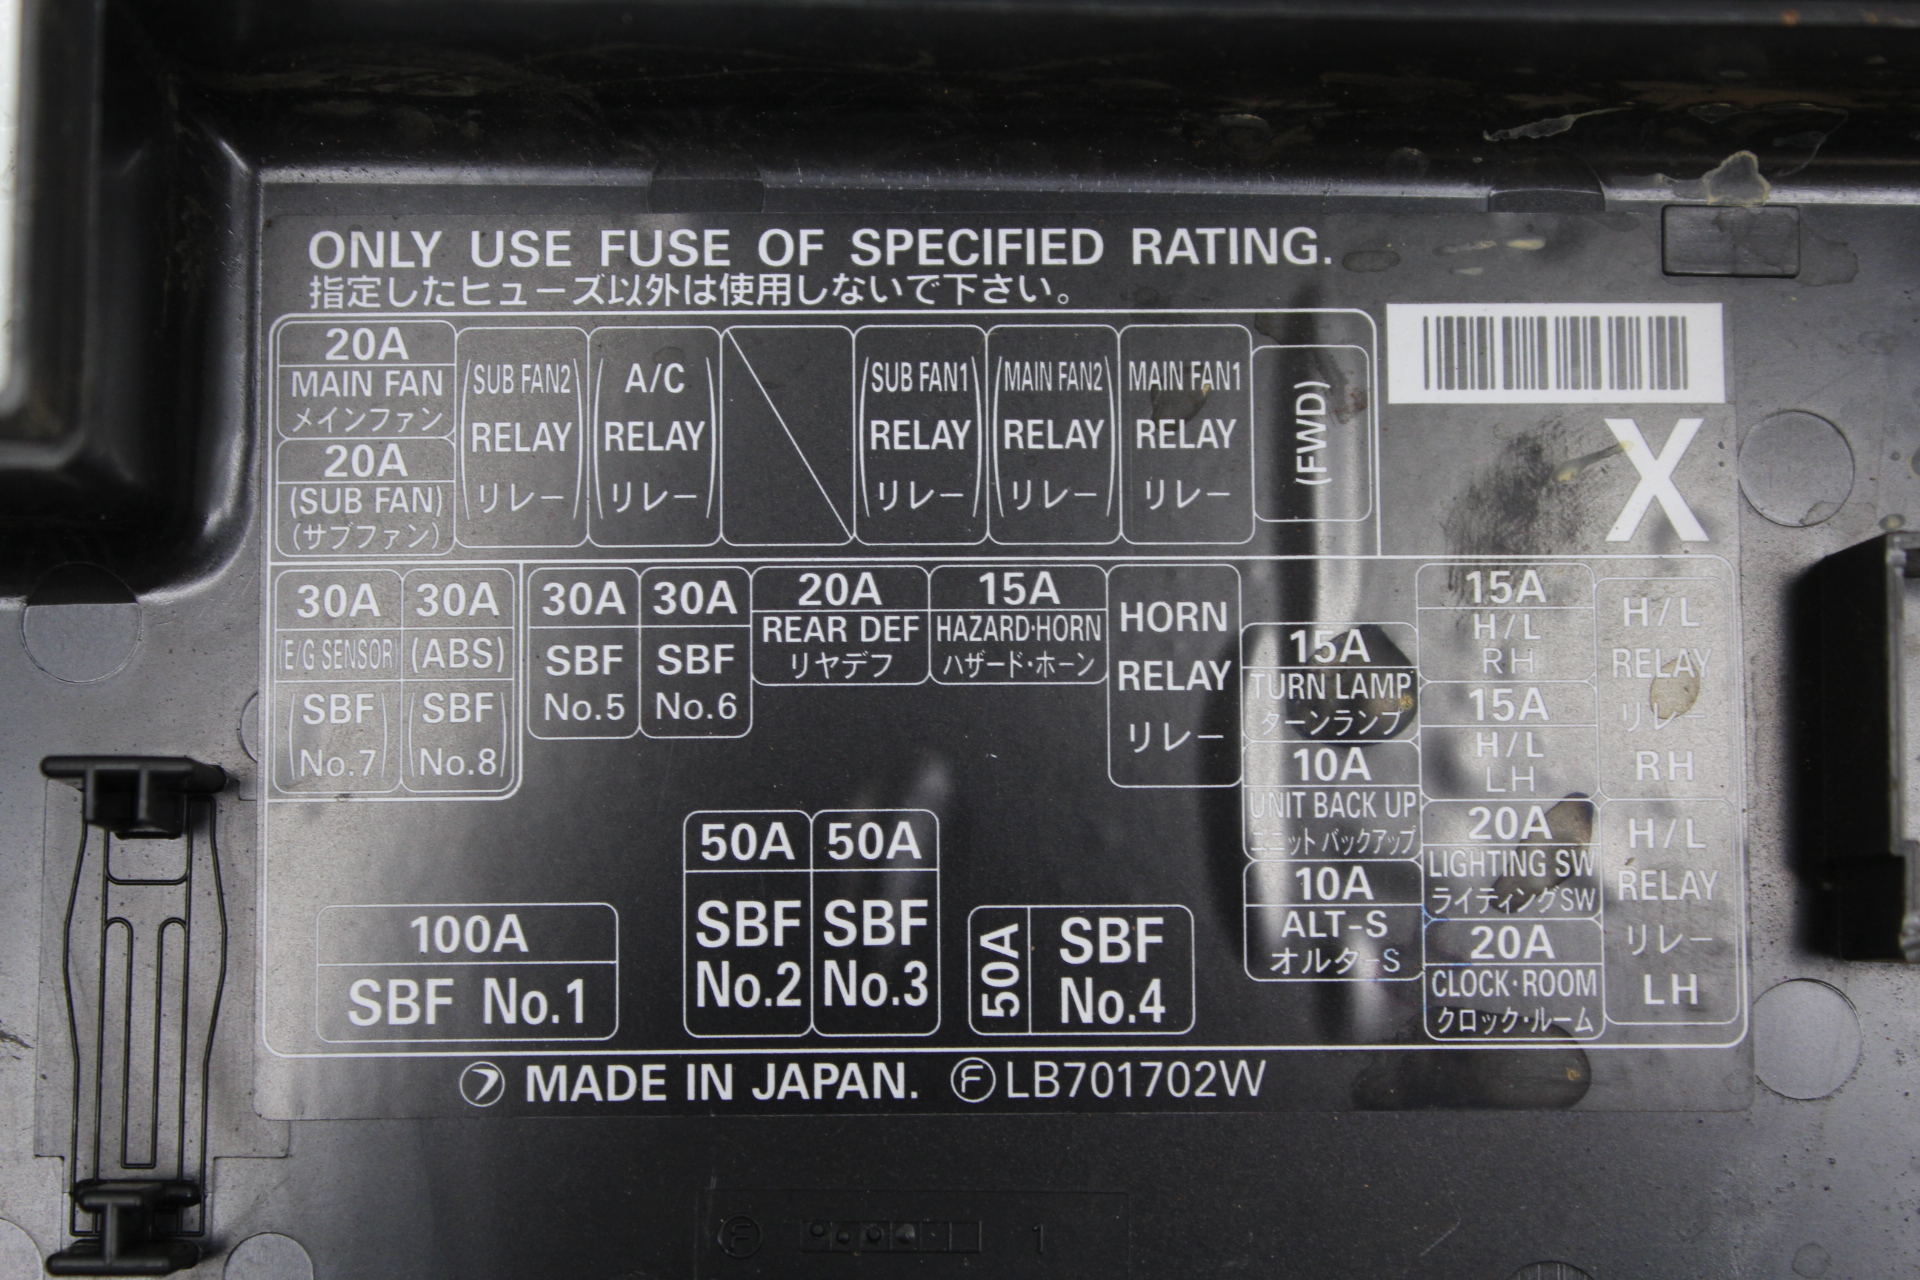 Subaru Impreza Gc8 Fuse Box Schematic Diagrams Wiring Diagram Free Download Wagon